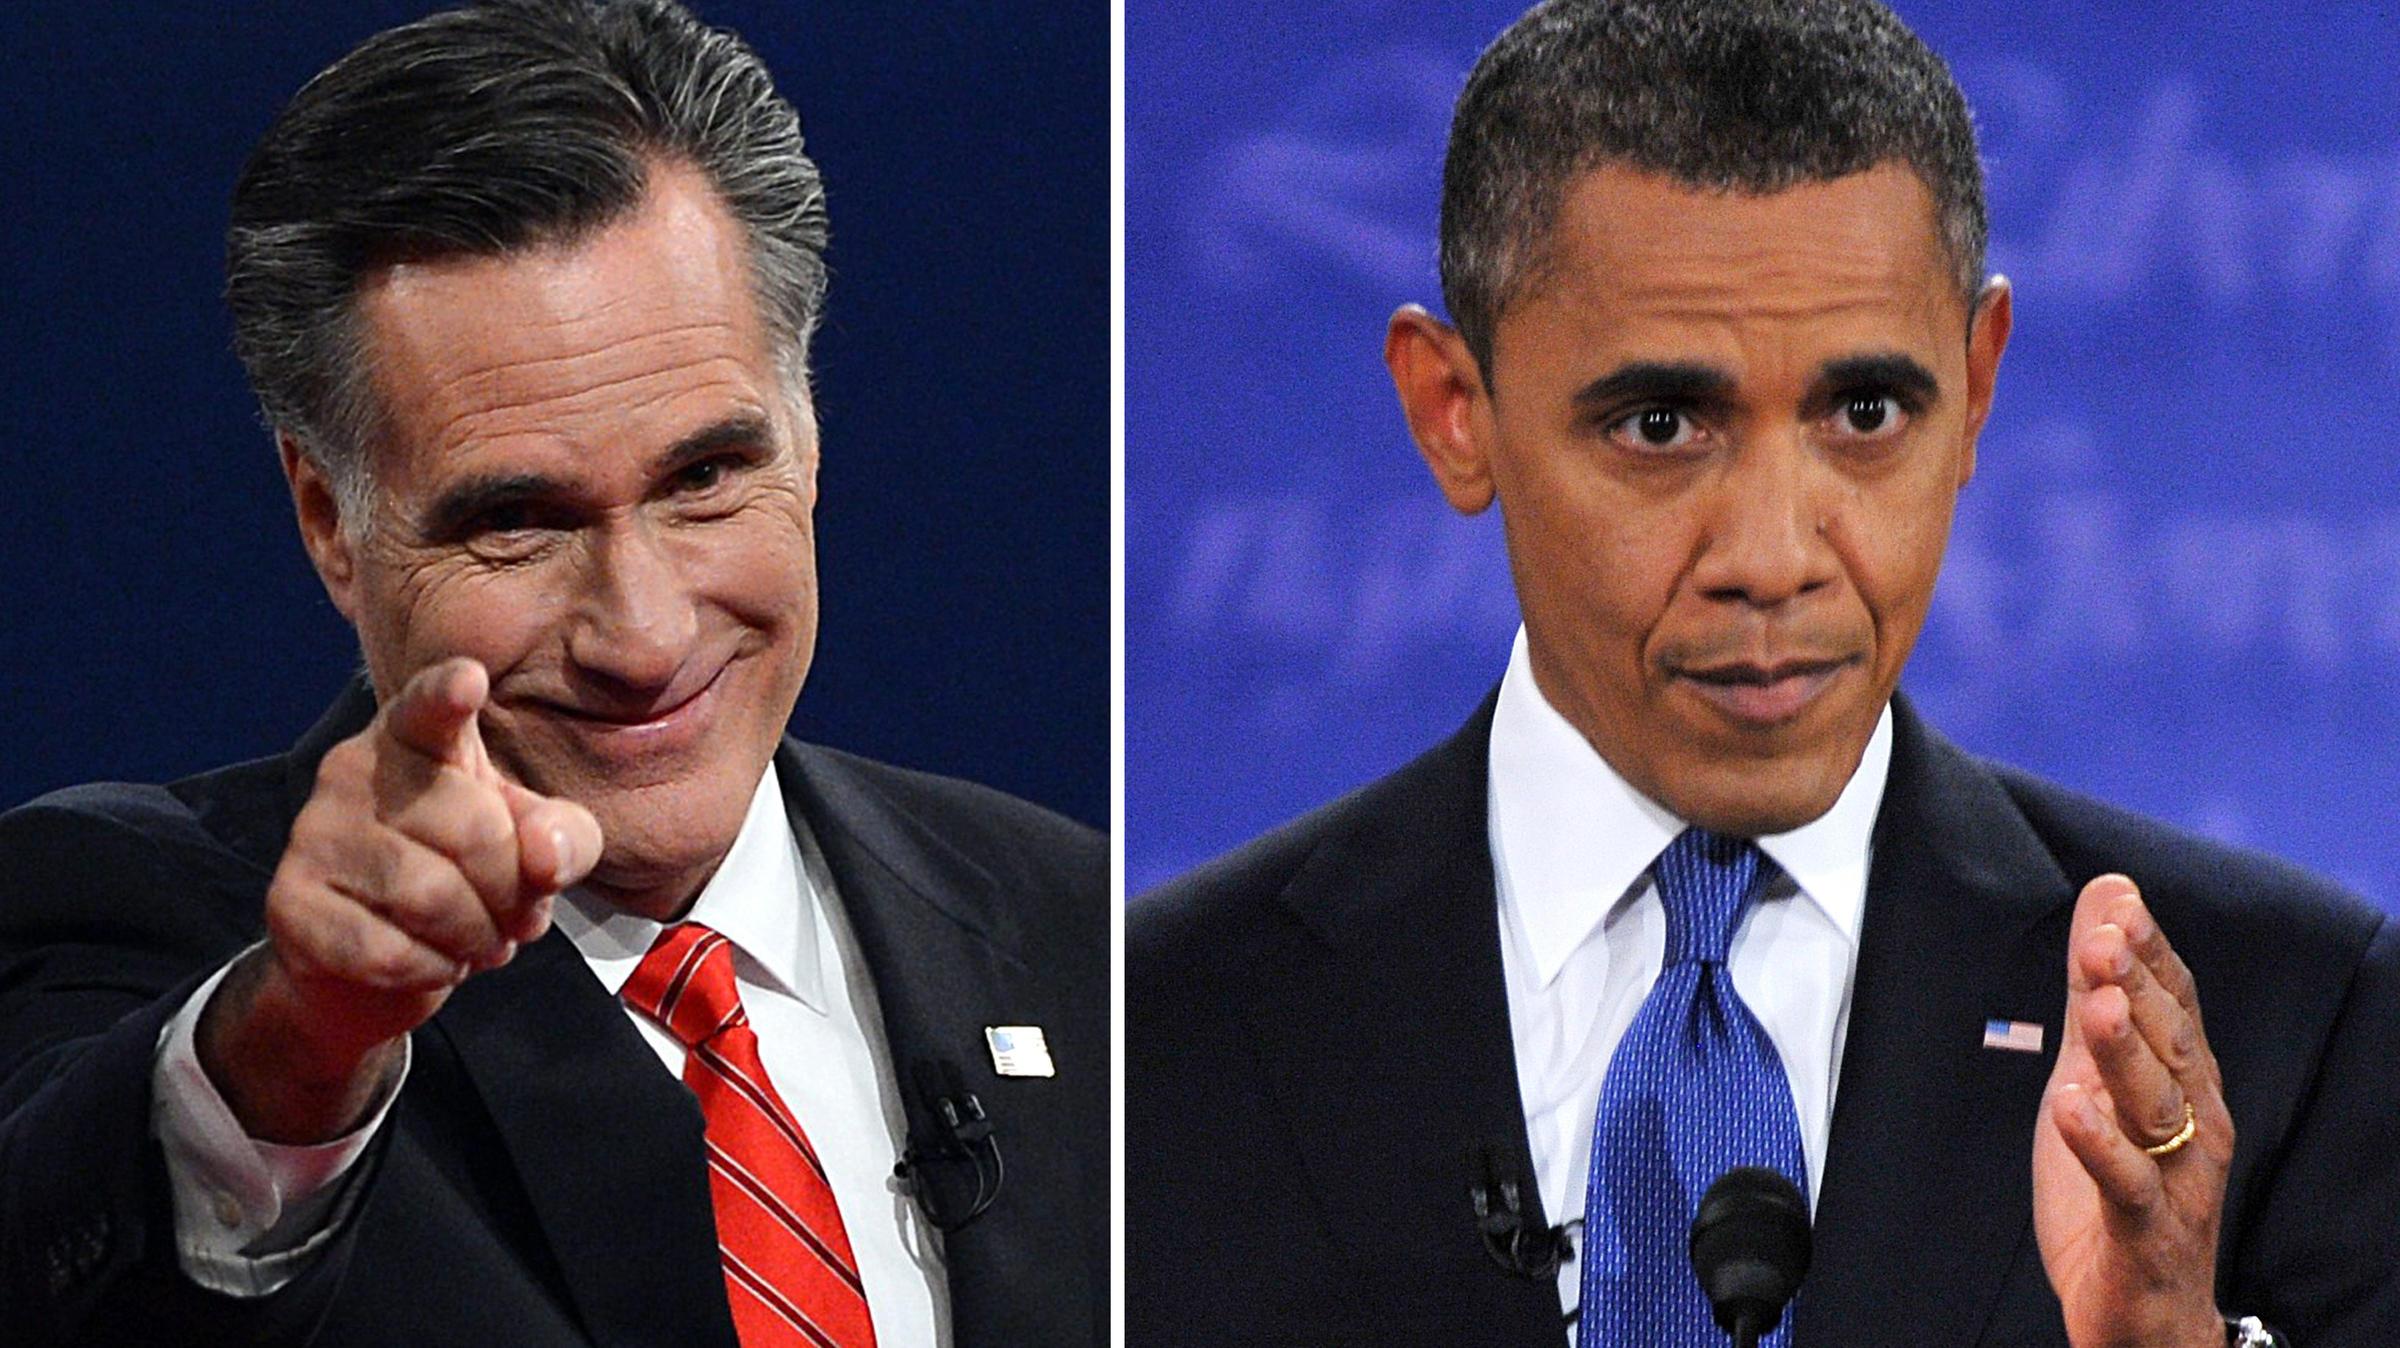 Data Project – Election Analysis: Romney vs Obama